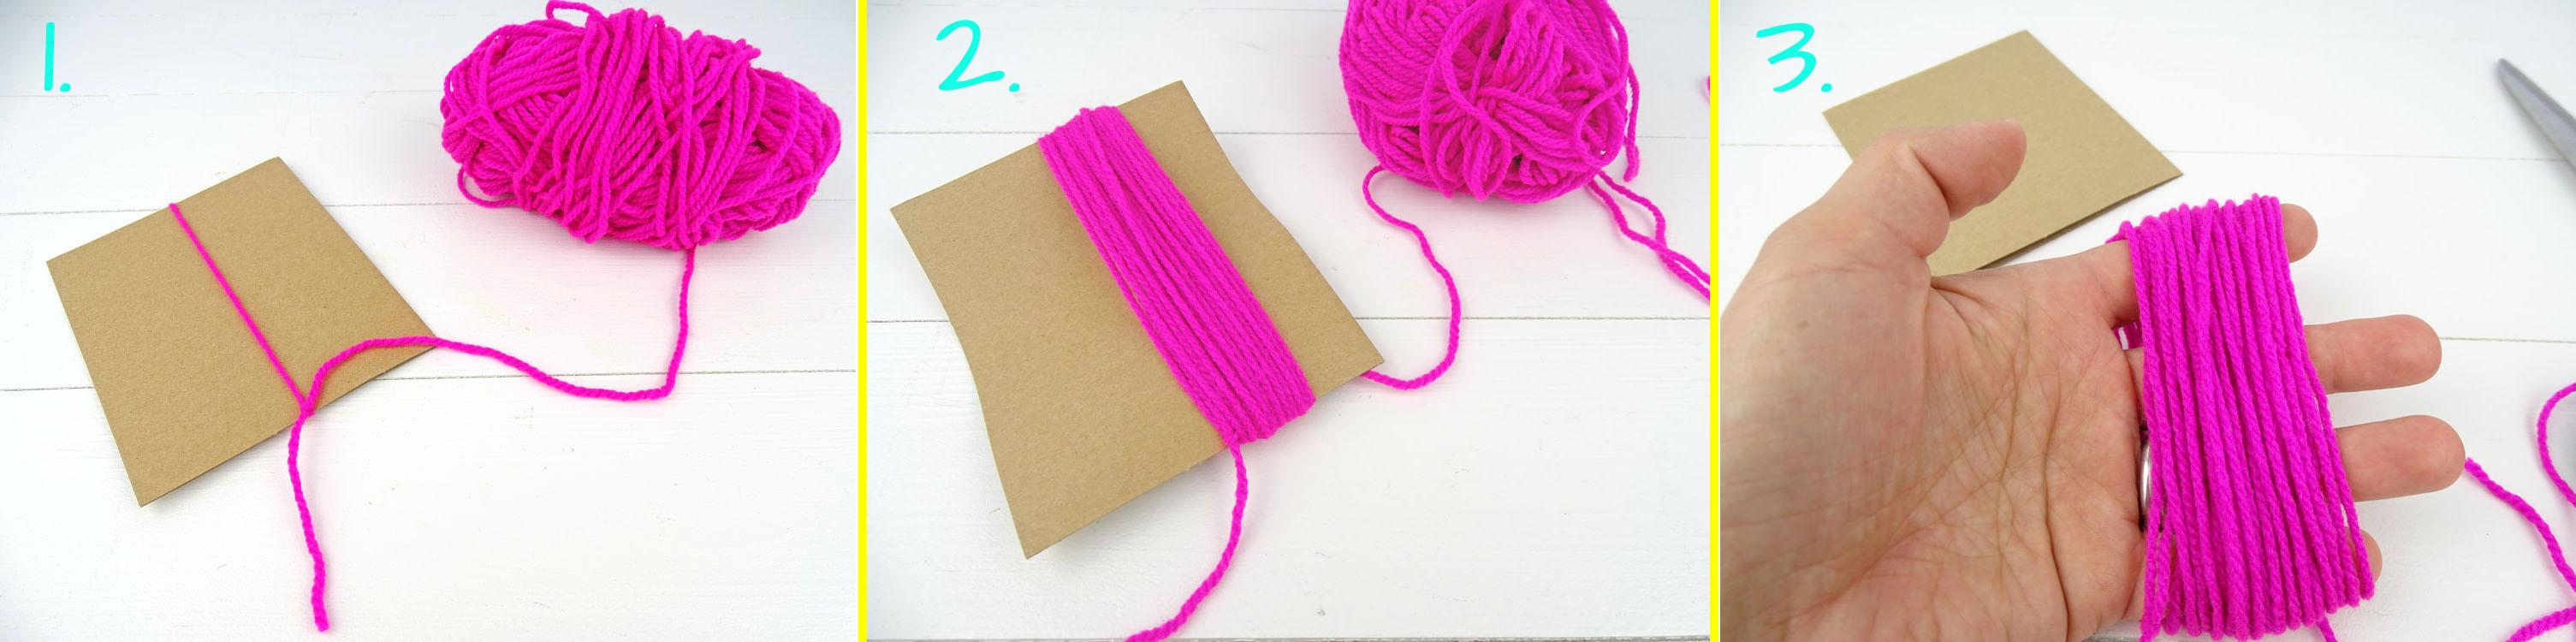 Anleitung 1-3 Tassel Girlande selbermachen DIY